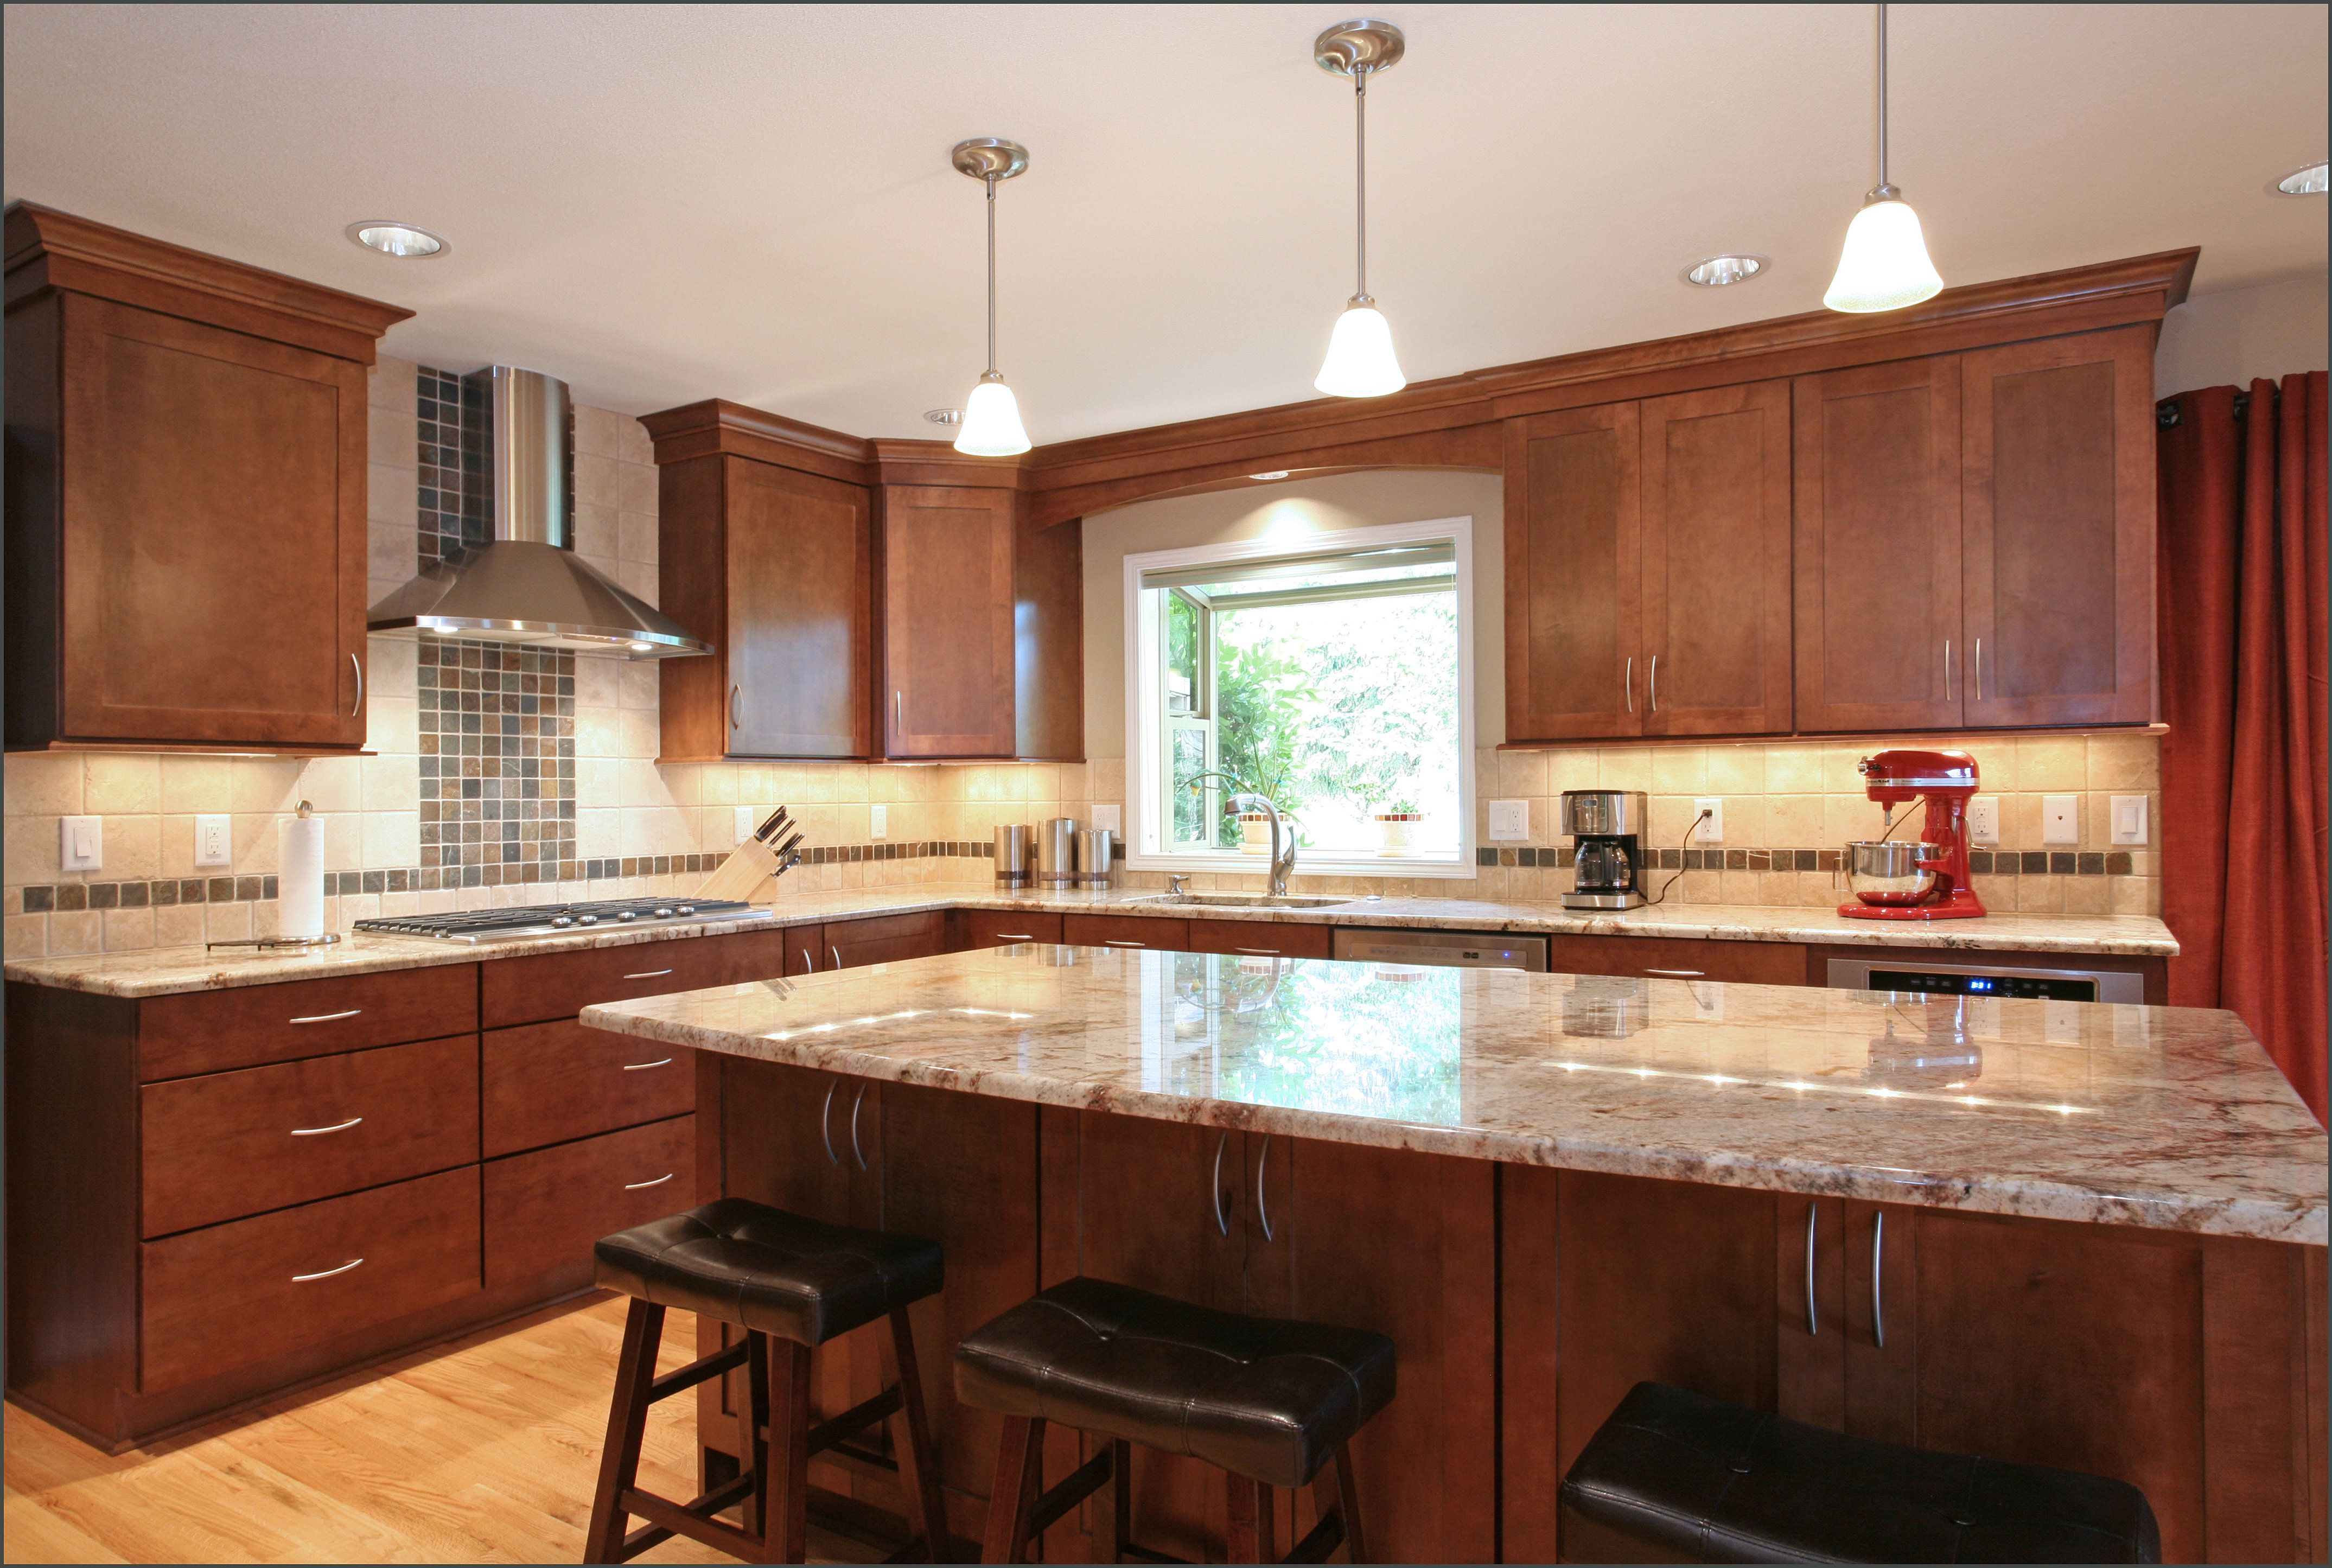 Kitchen Improvements Expert Home Improvements Kitchen Bath Renovations